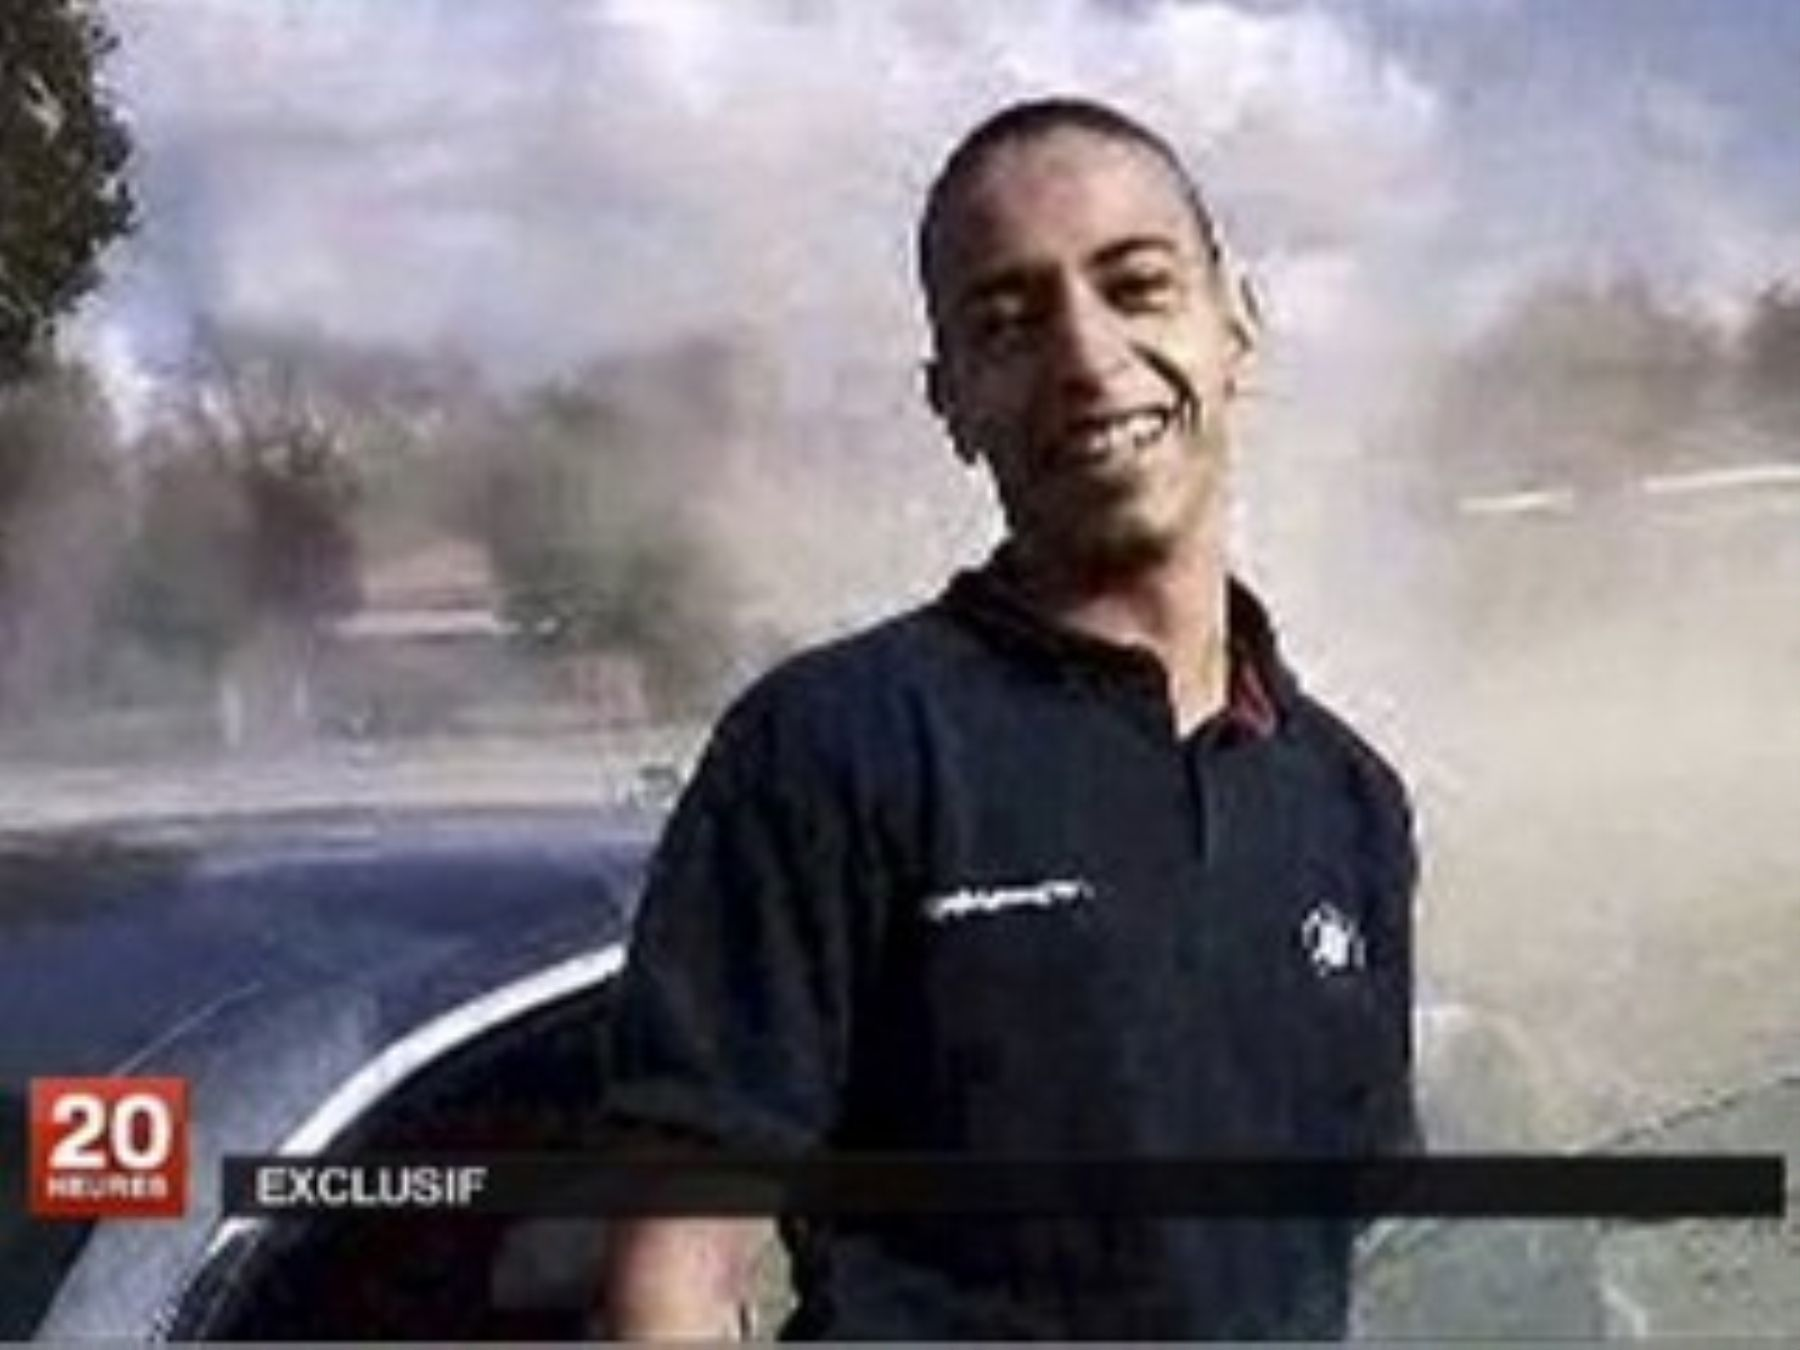 Policía francesa cercó a sospechoso de asesinar a siete personas. Foto: ANDINA/Internet.